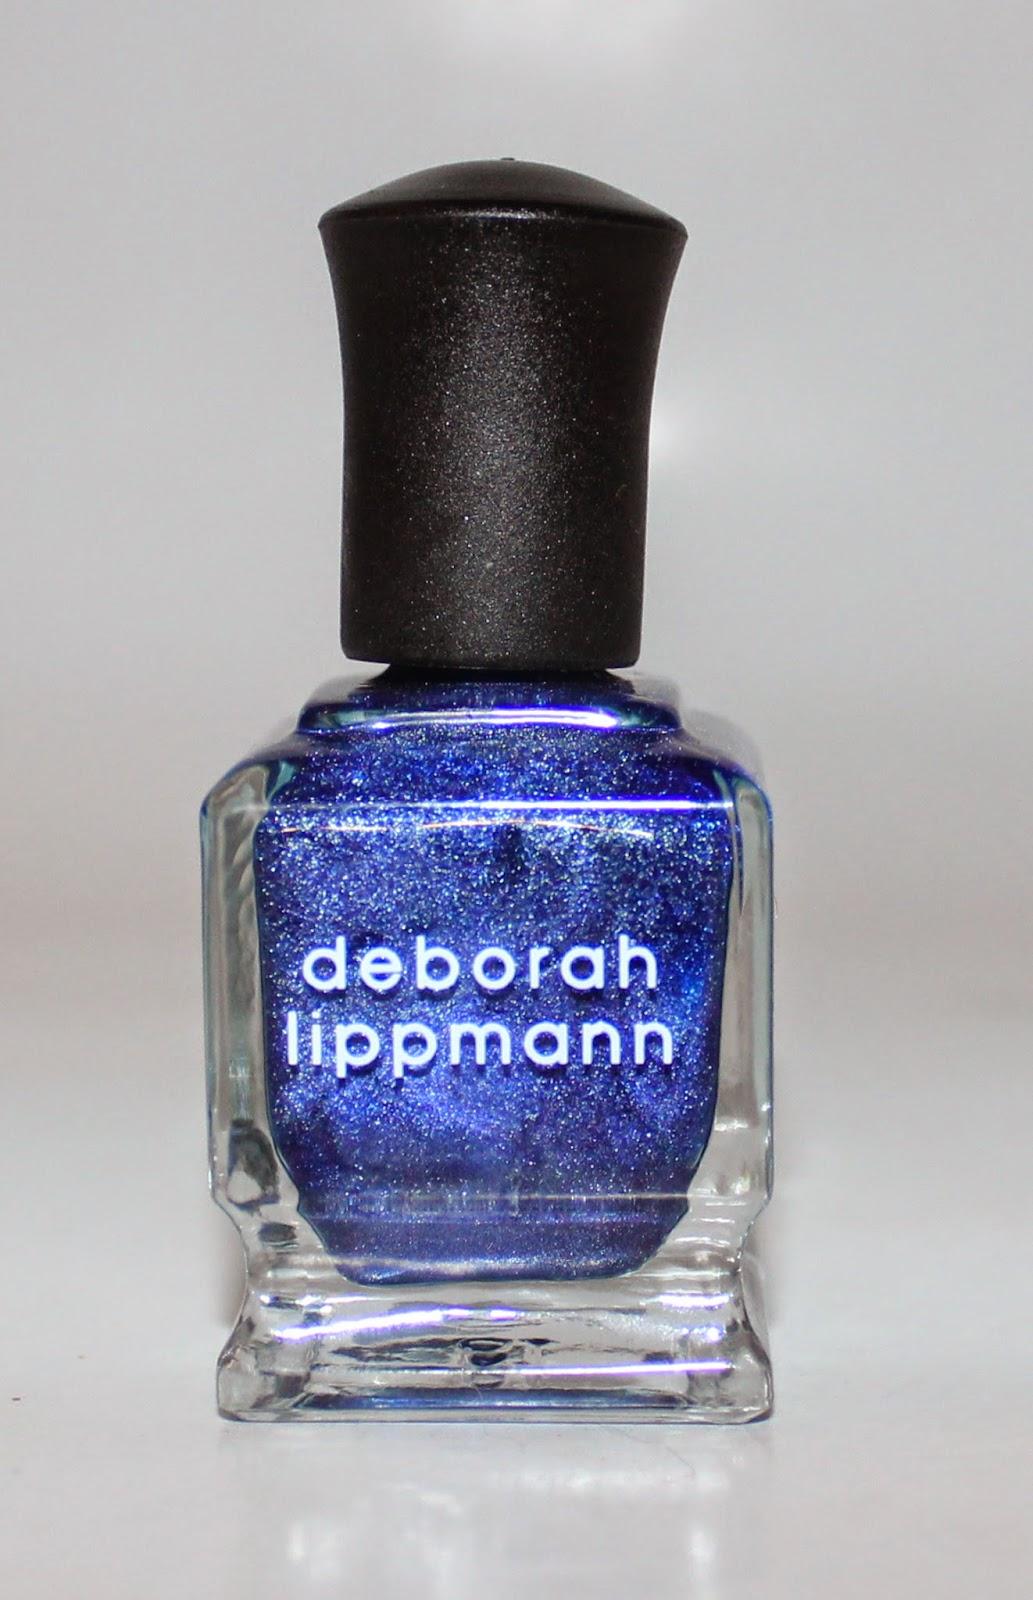 Deborah Lippmann Harlem Nocturne